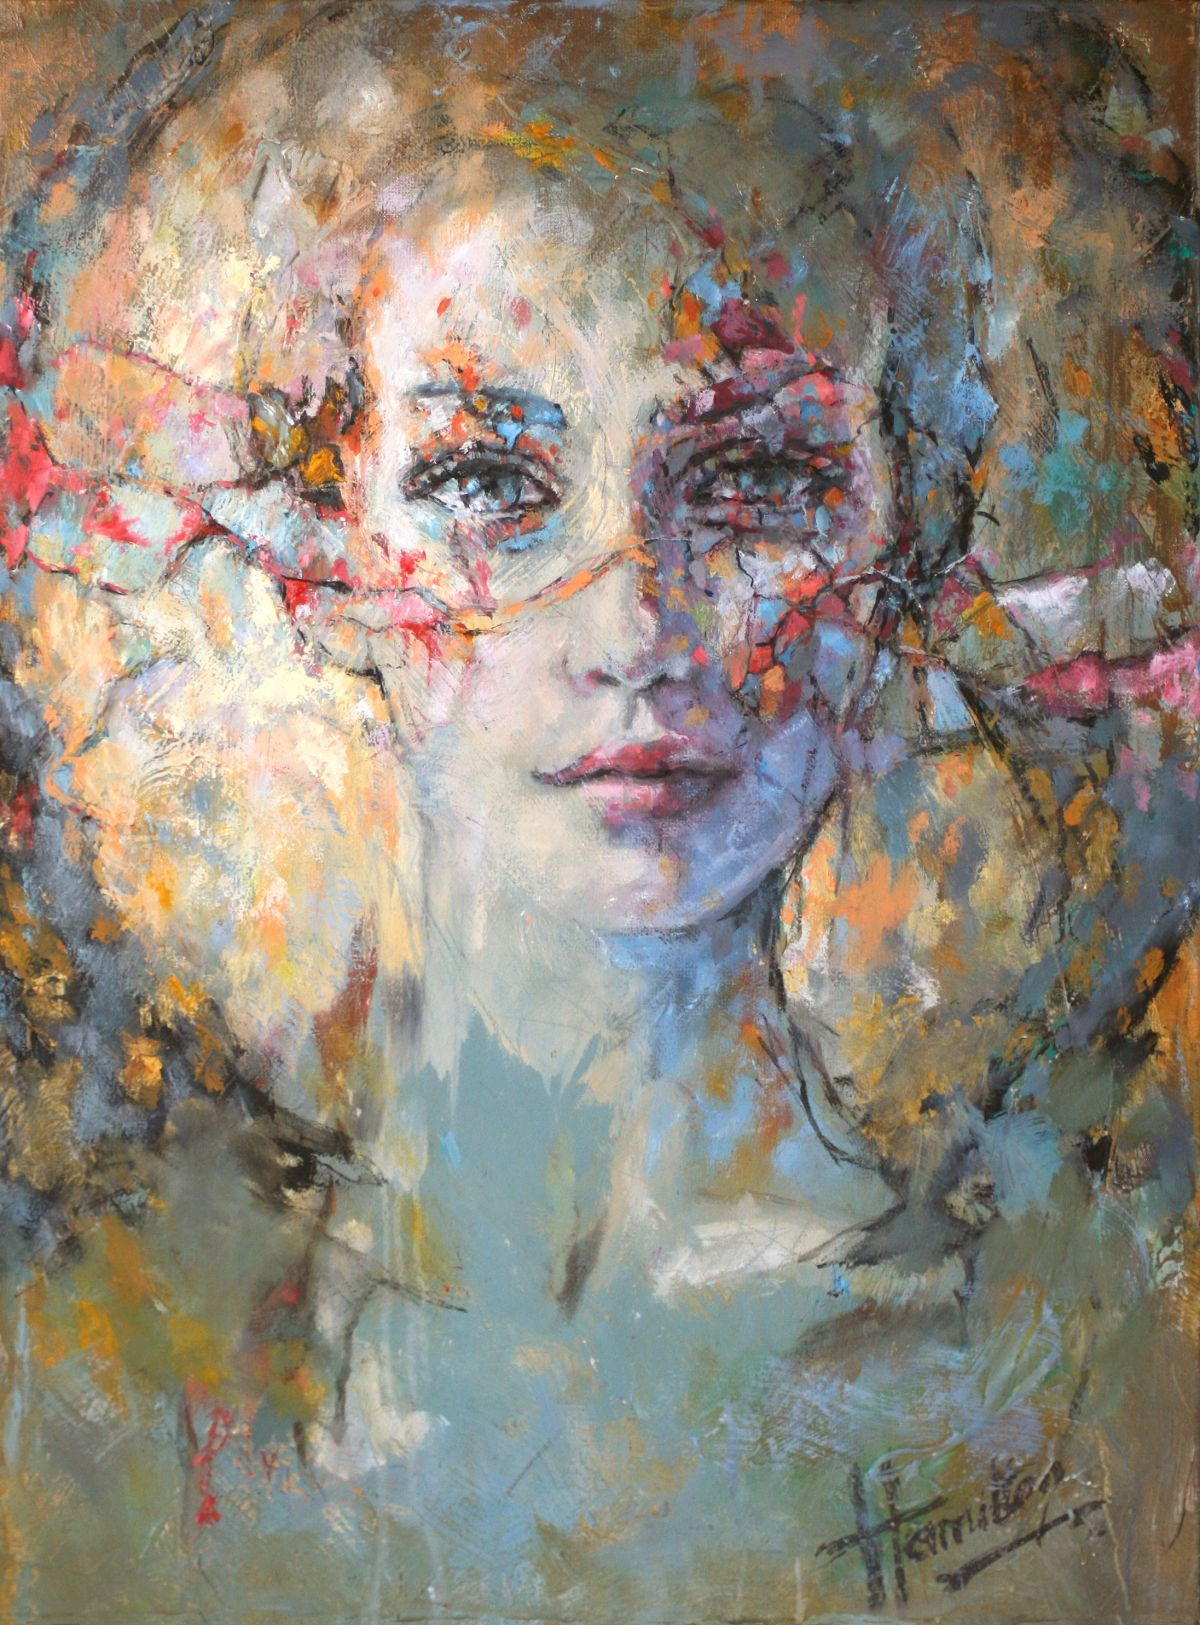 Kunst: Just Me van kunstenaar Evelyn Hamilton